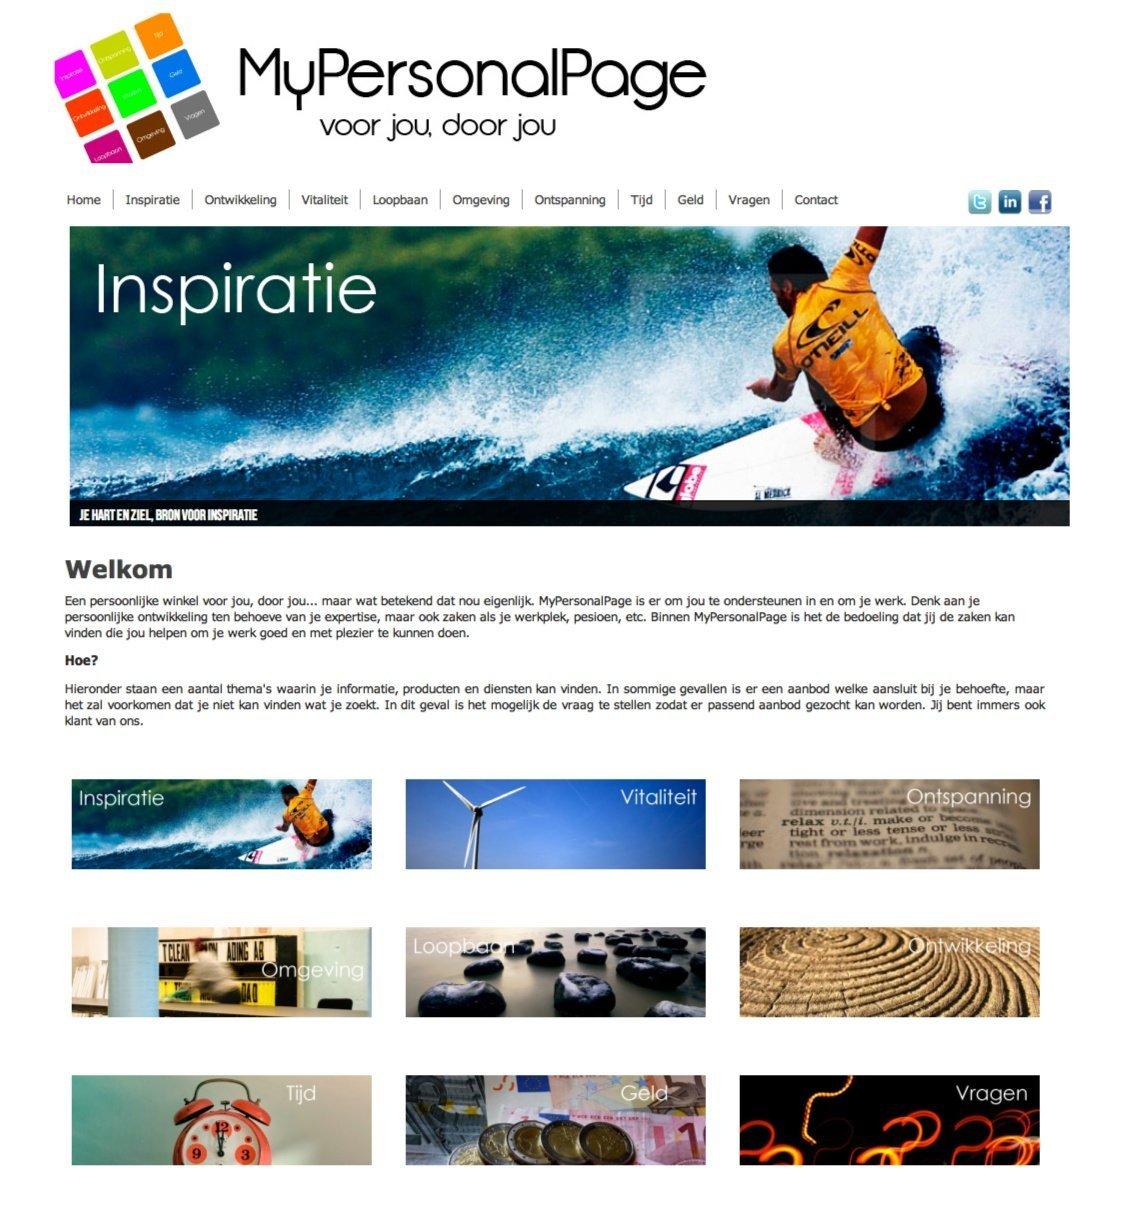 www.mypersonalpage.nl